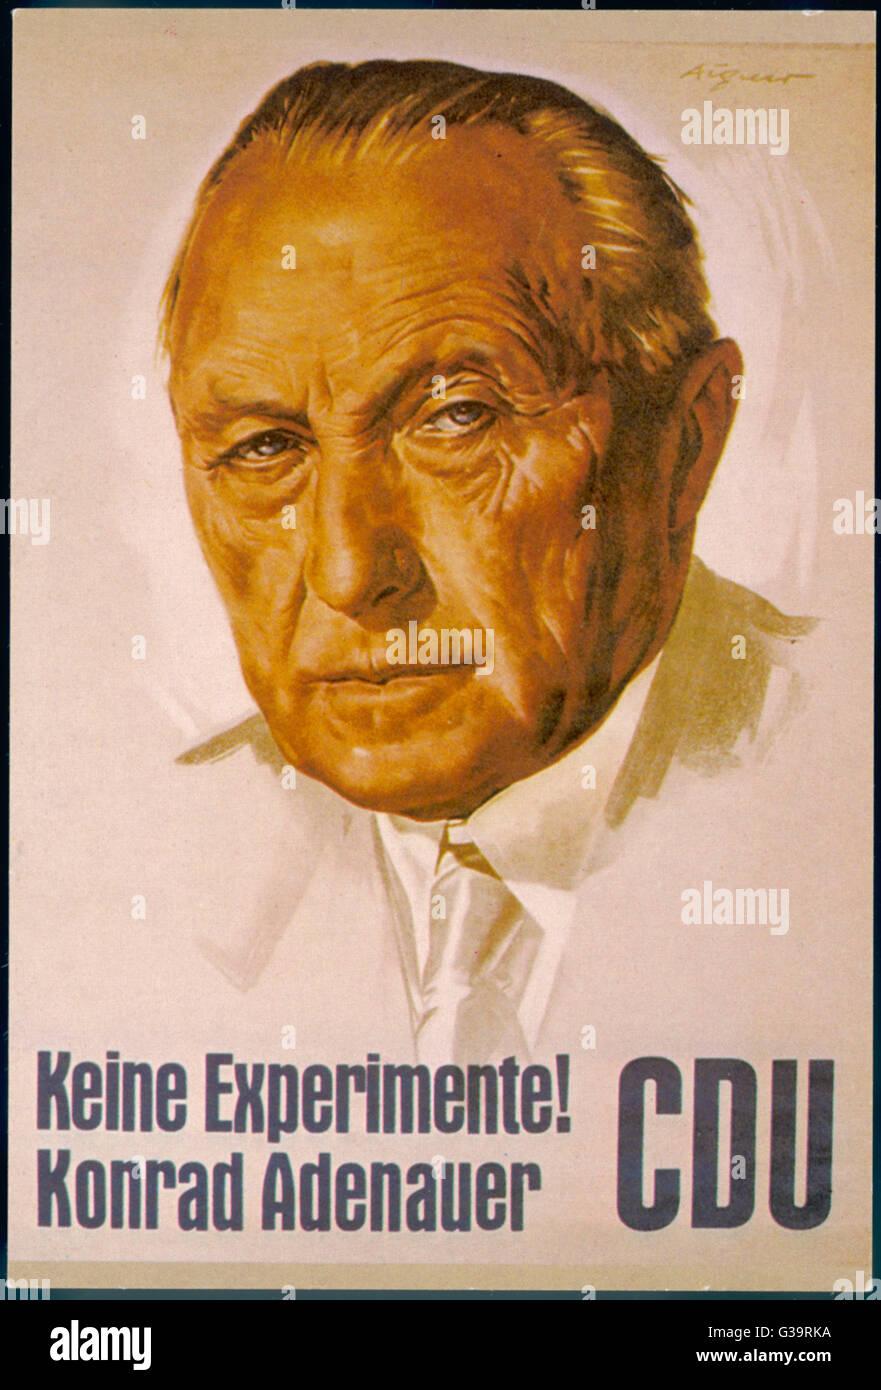 Campaign poster for poster German statesman, Konrad Adenauer and his Christian Democratic Union (CDU Christlich - Stock Image